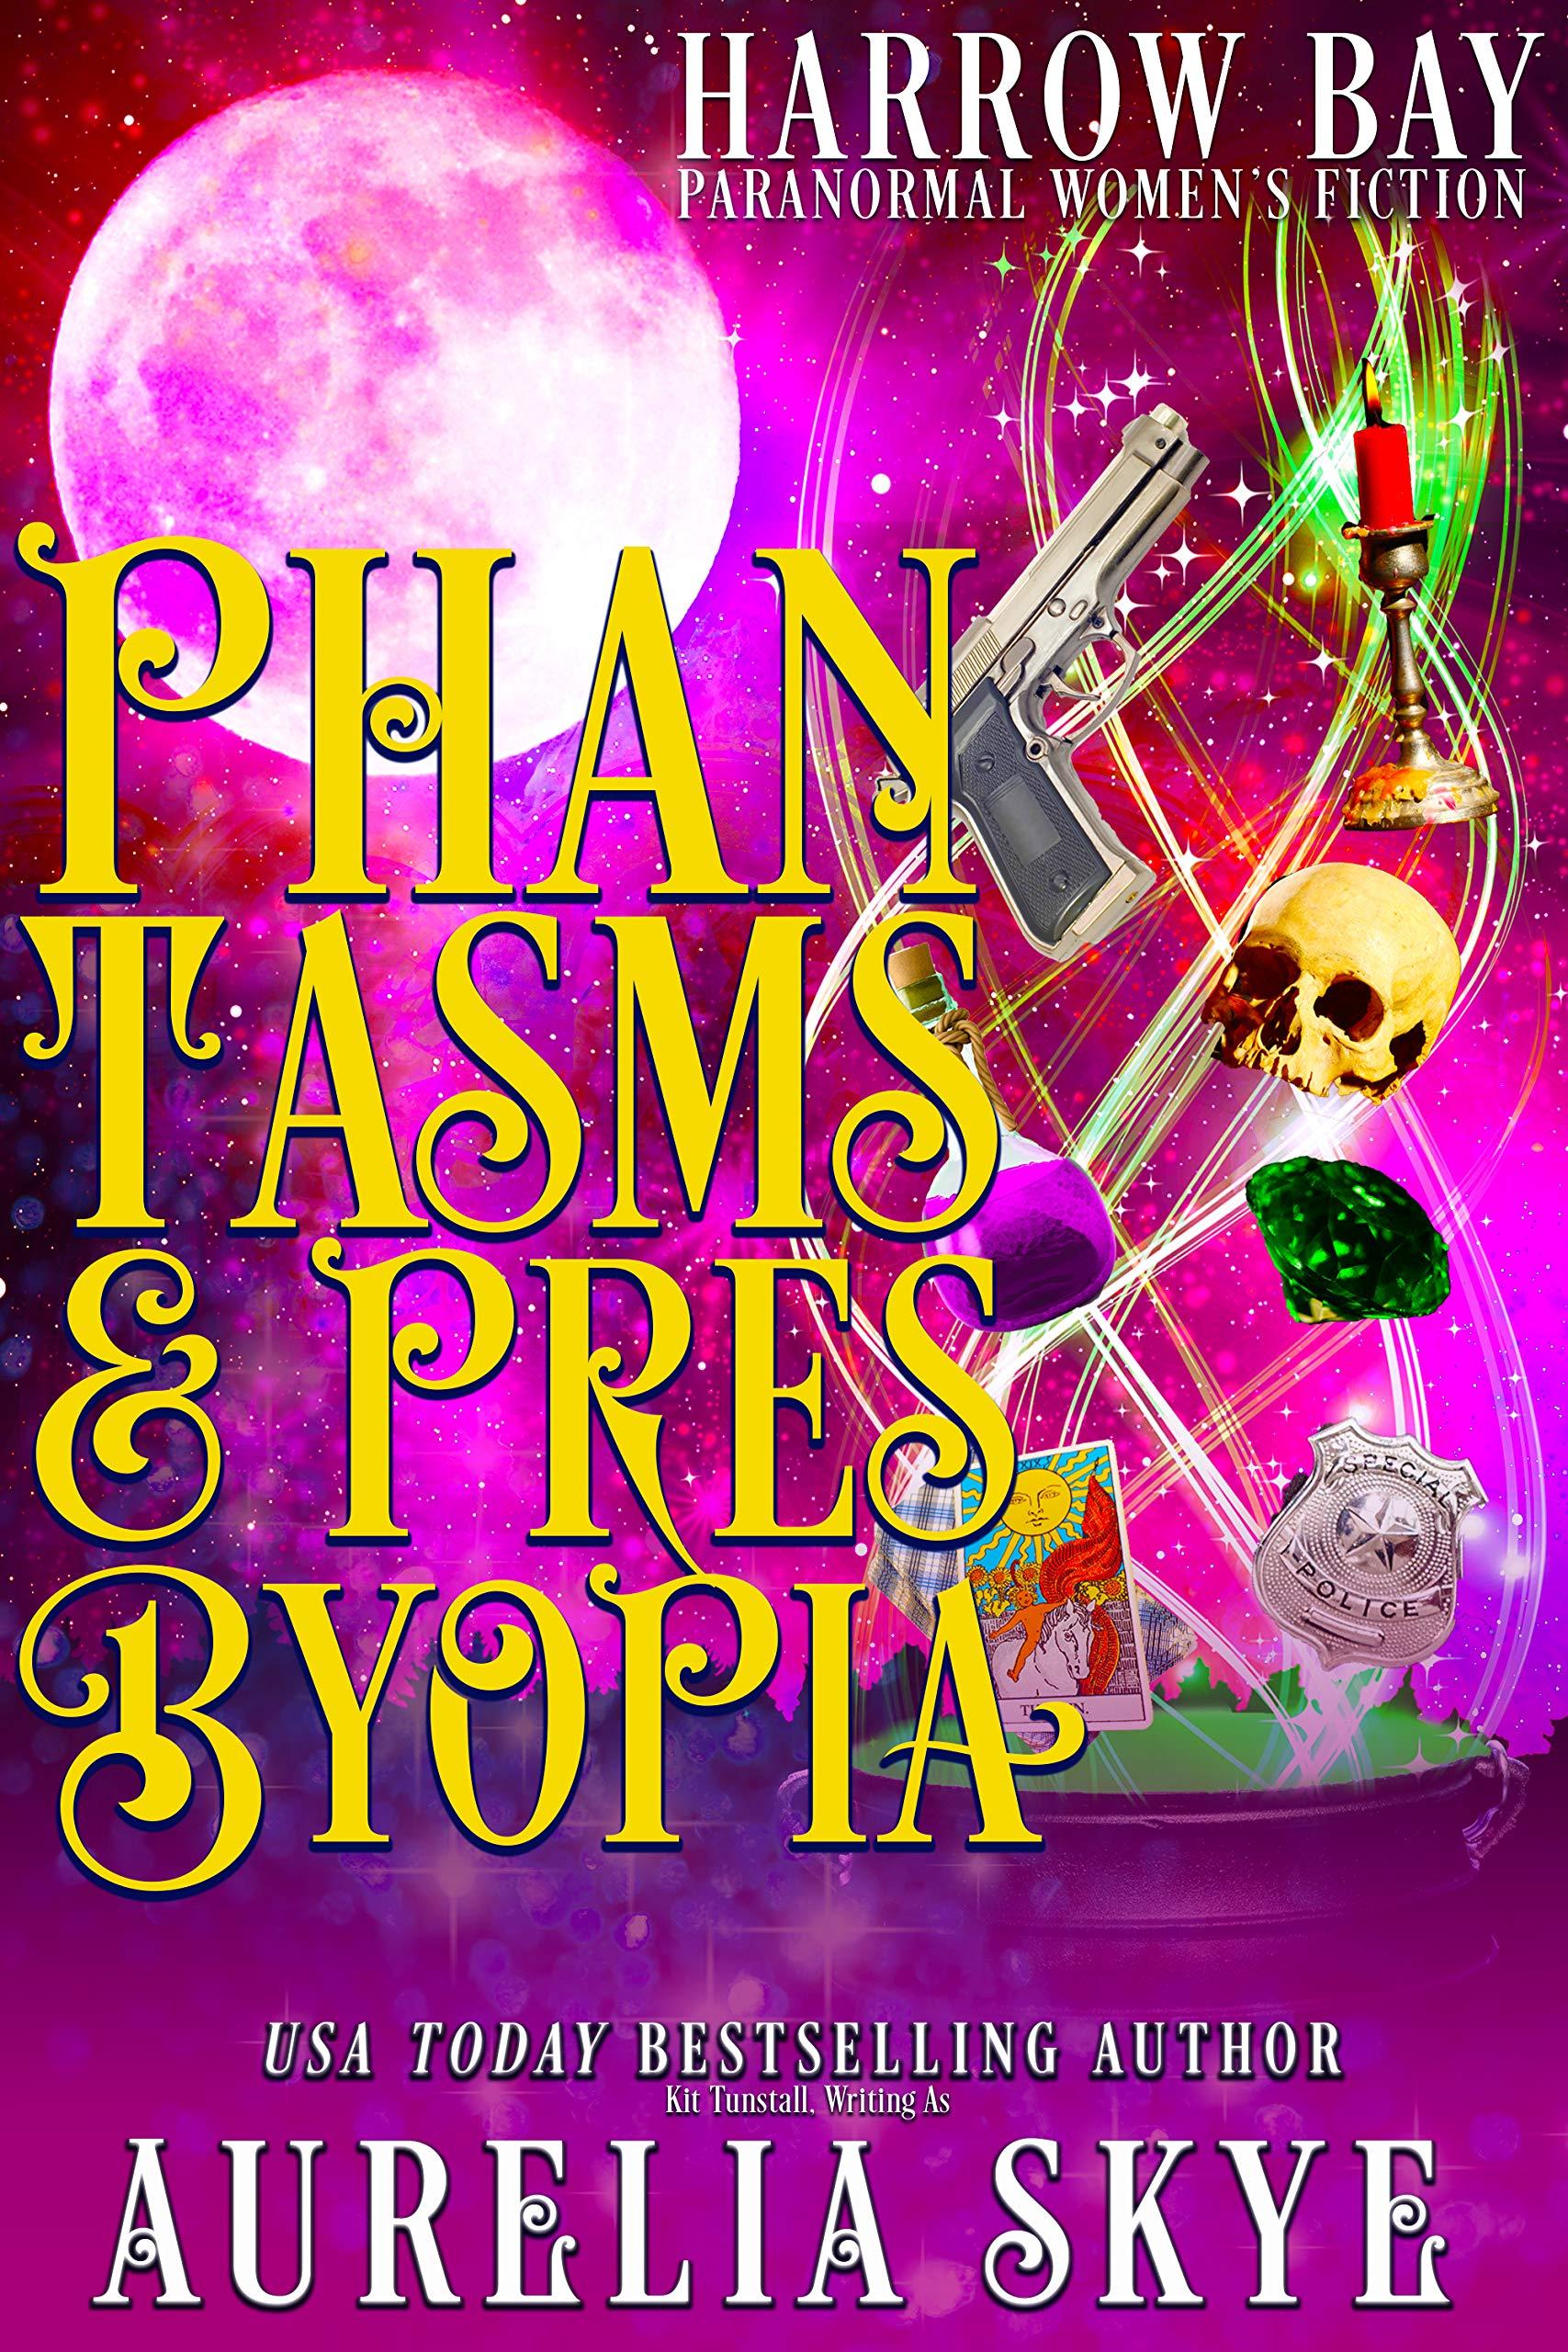 Phantasms & Presbyopia: Paranormal Women's Fiction (Harrow Bay Book 5)